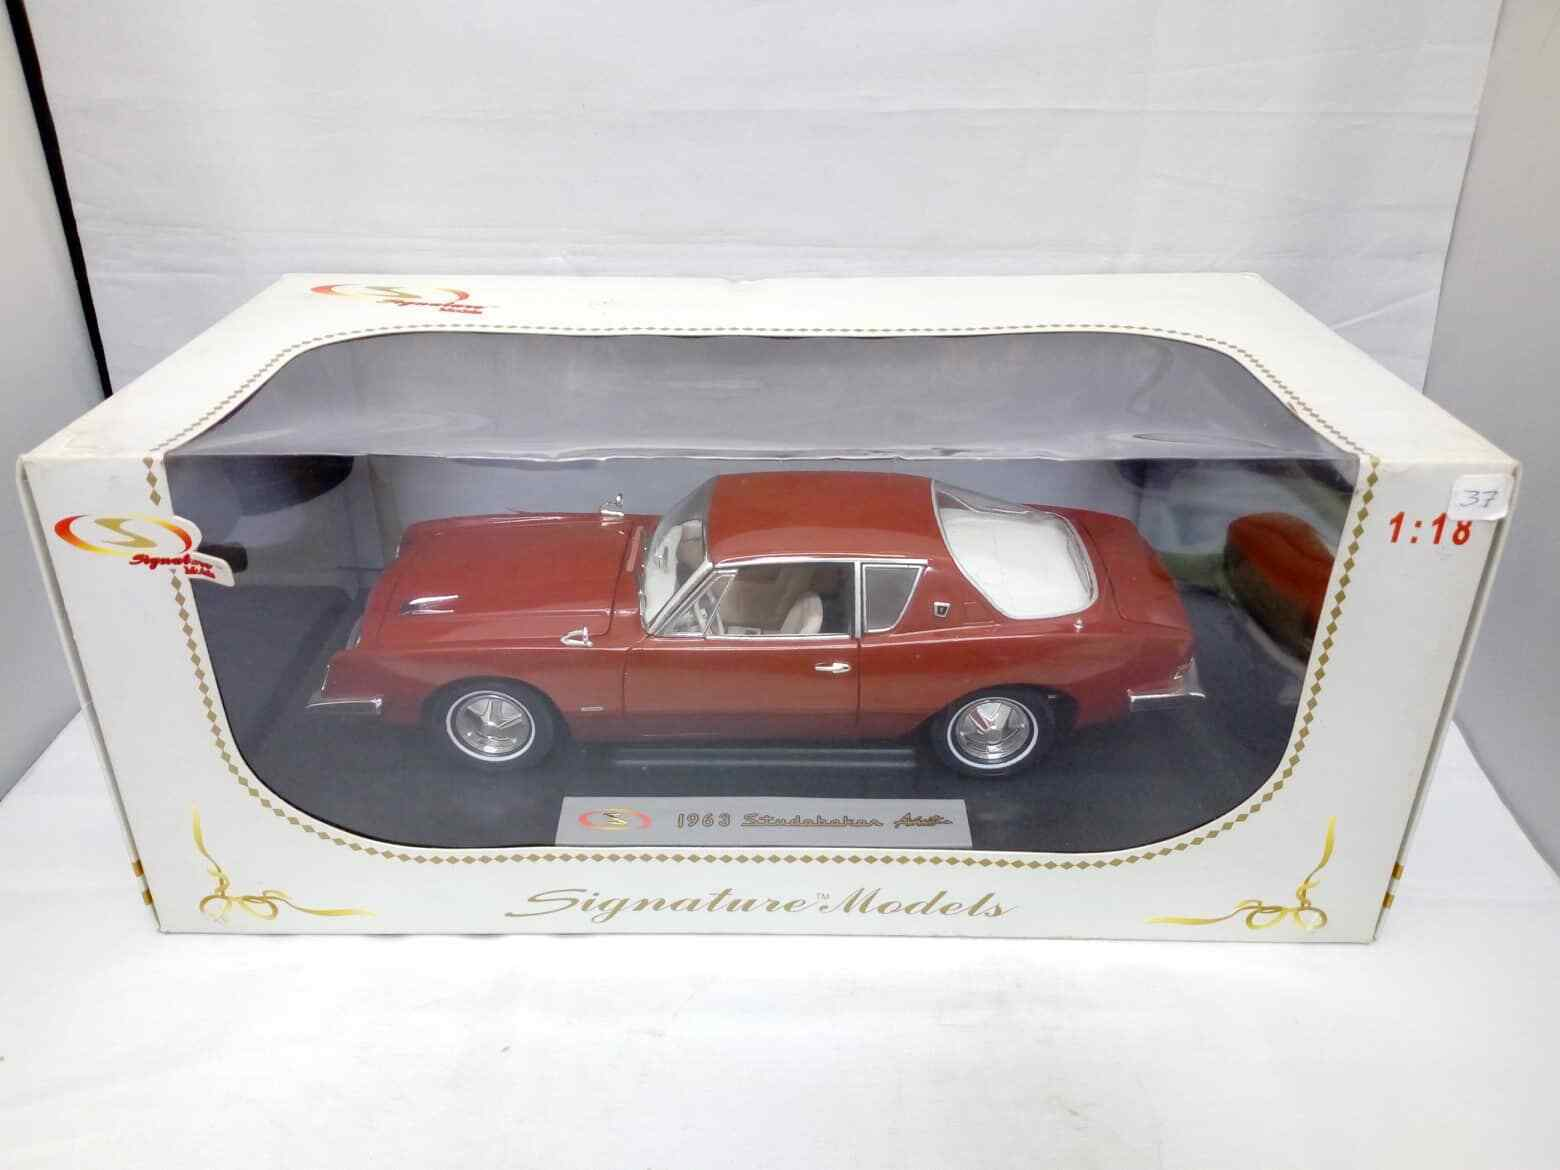 Signature Diecast Model 1963 Studebaker Avanti  1 18 Scale rot 18101